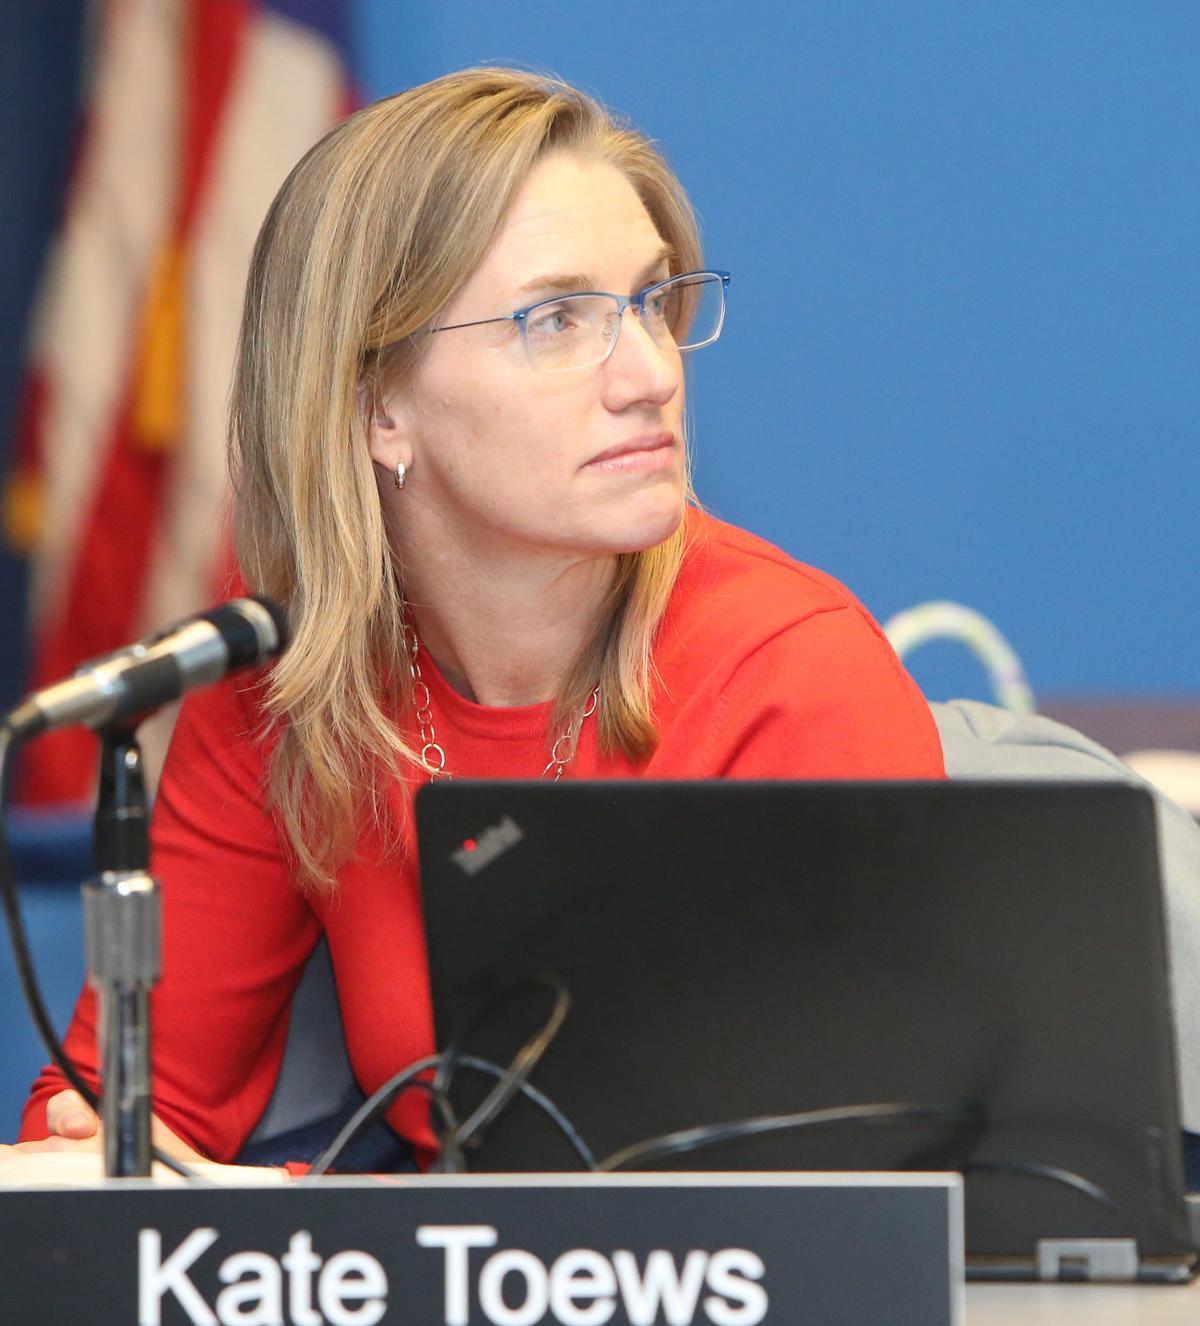 Kate Toews